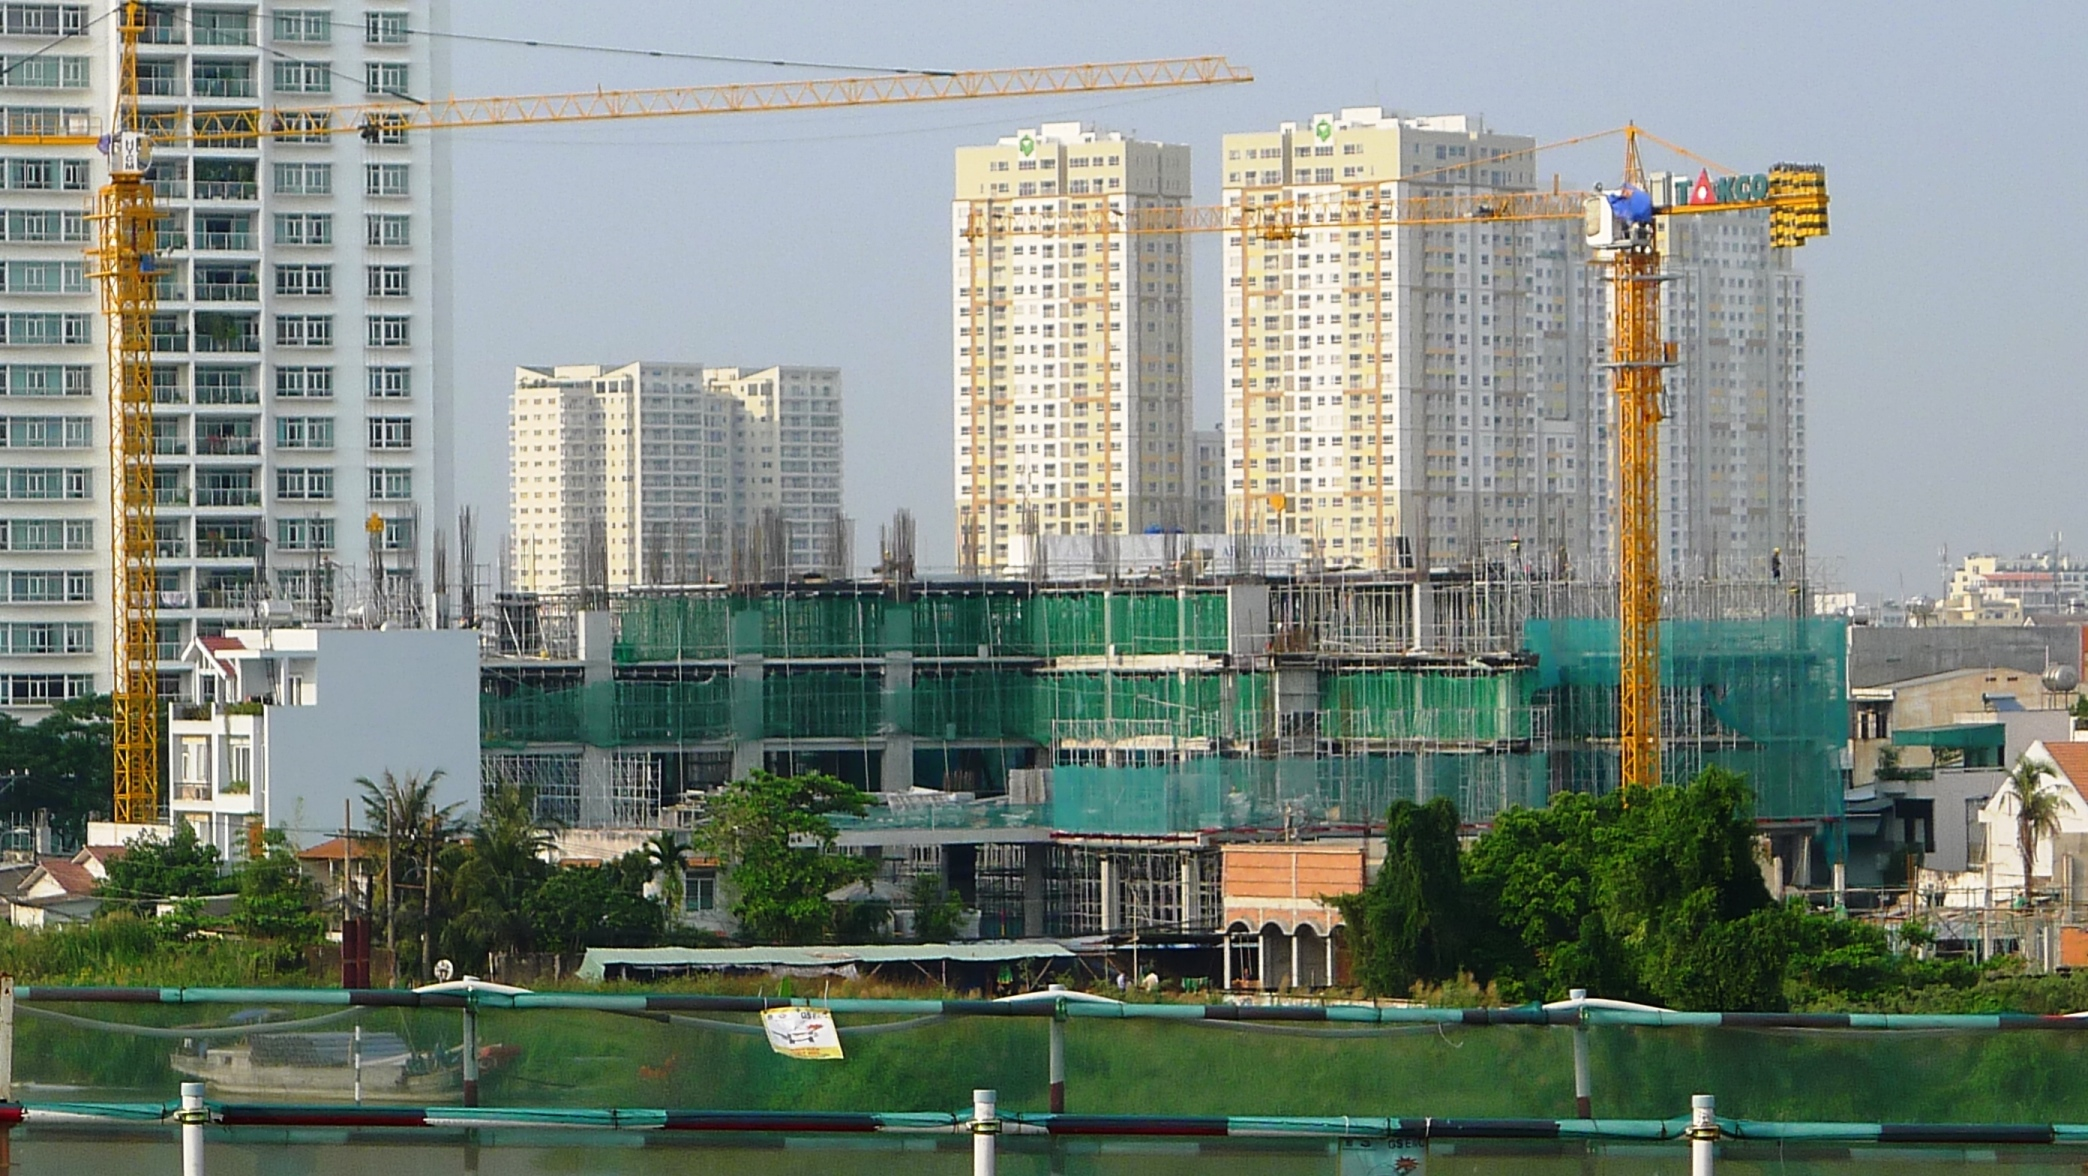 01 View to campus from Saigon bridge.jpg